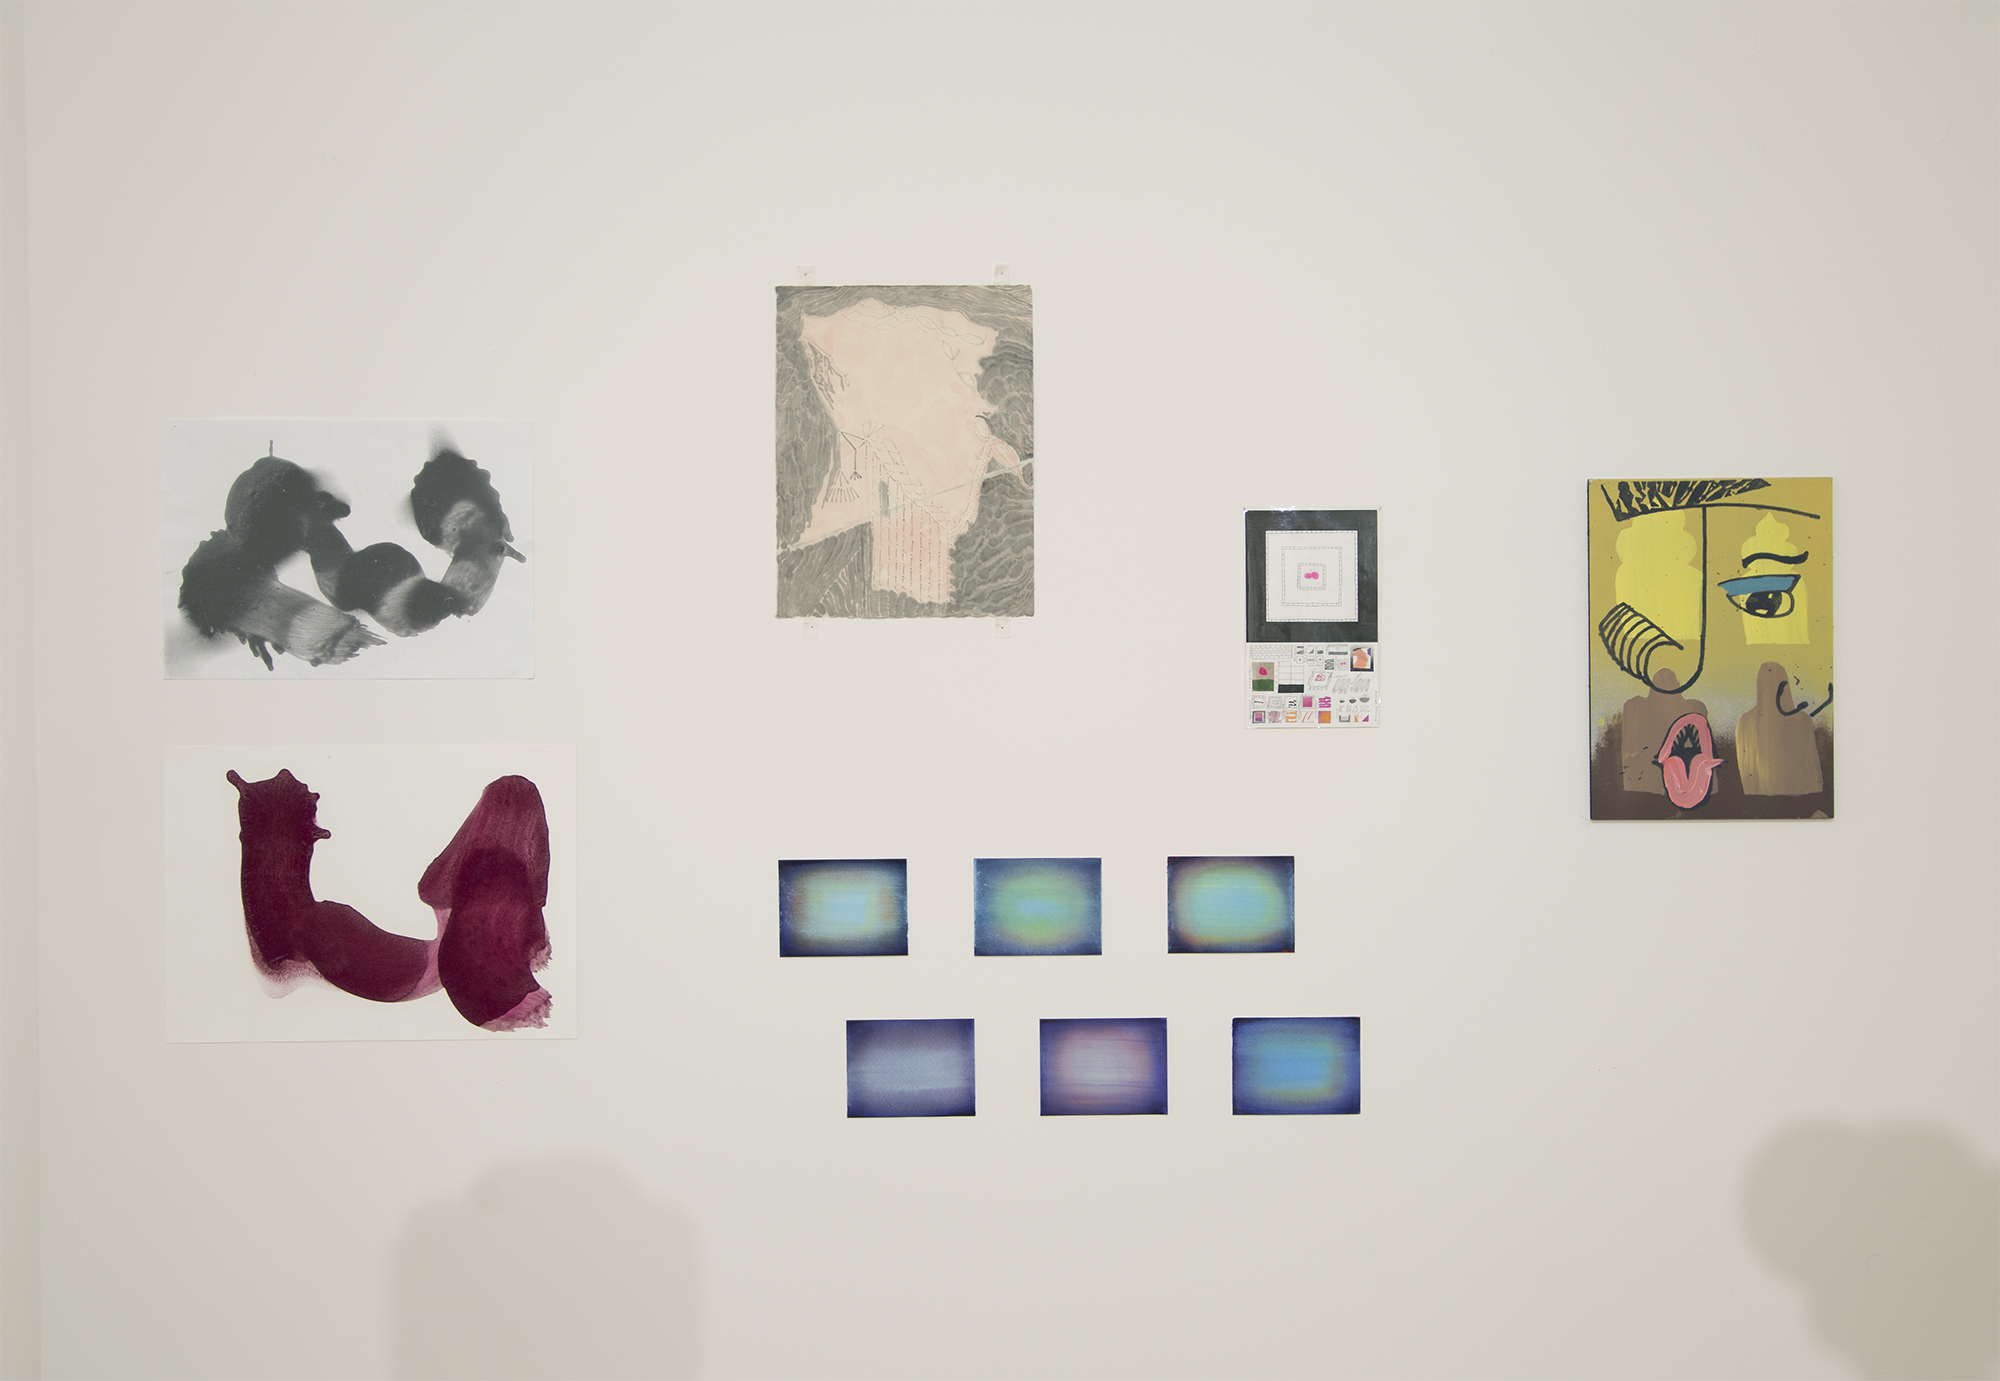 (clockwise starting with magenta and b/w piece) Richard Neal / Eric Schnell / Yuri Masnyj / Melissa Brown / Julia Münstermann (6 small works)